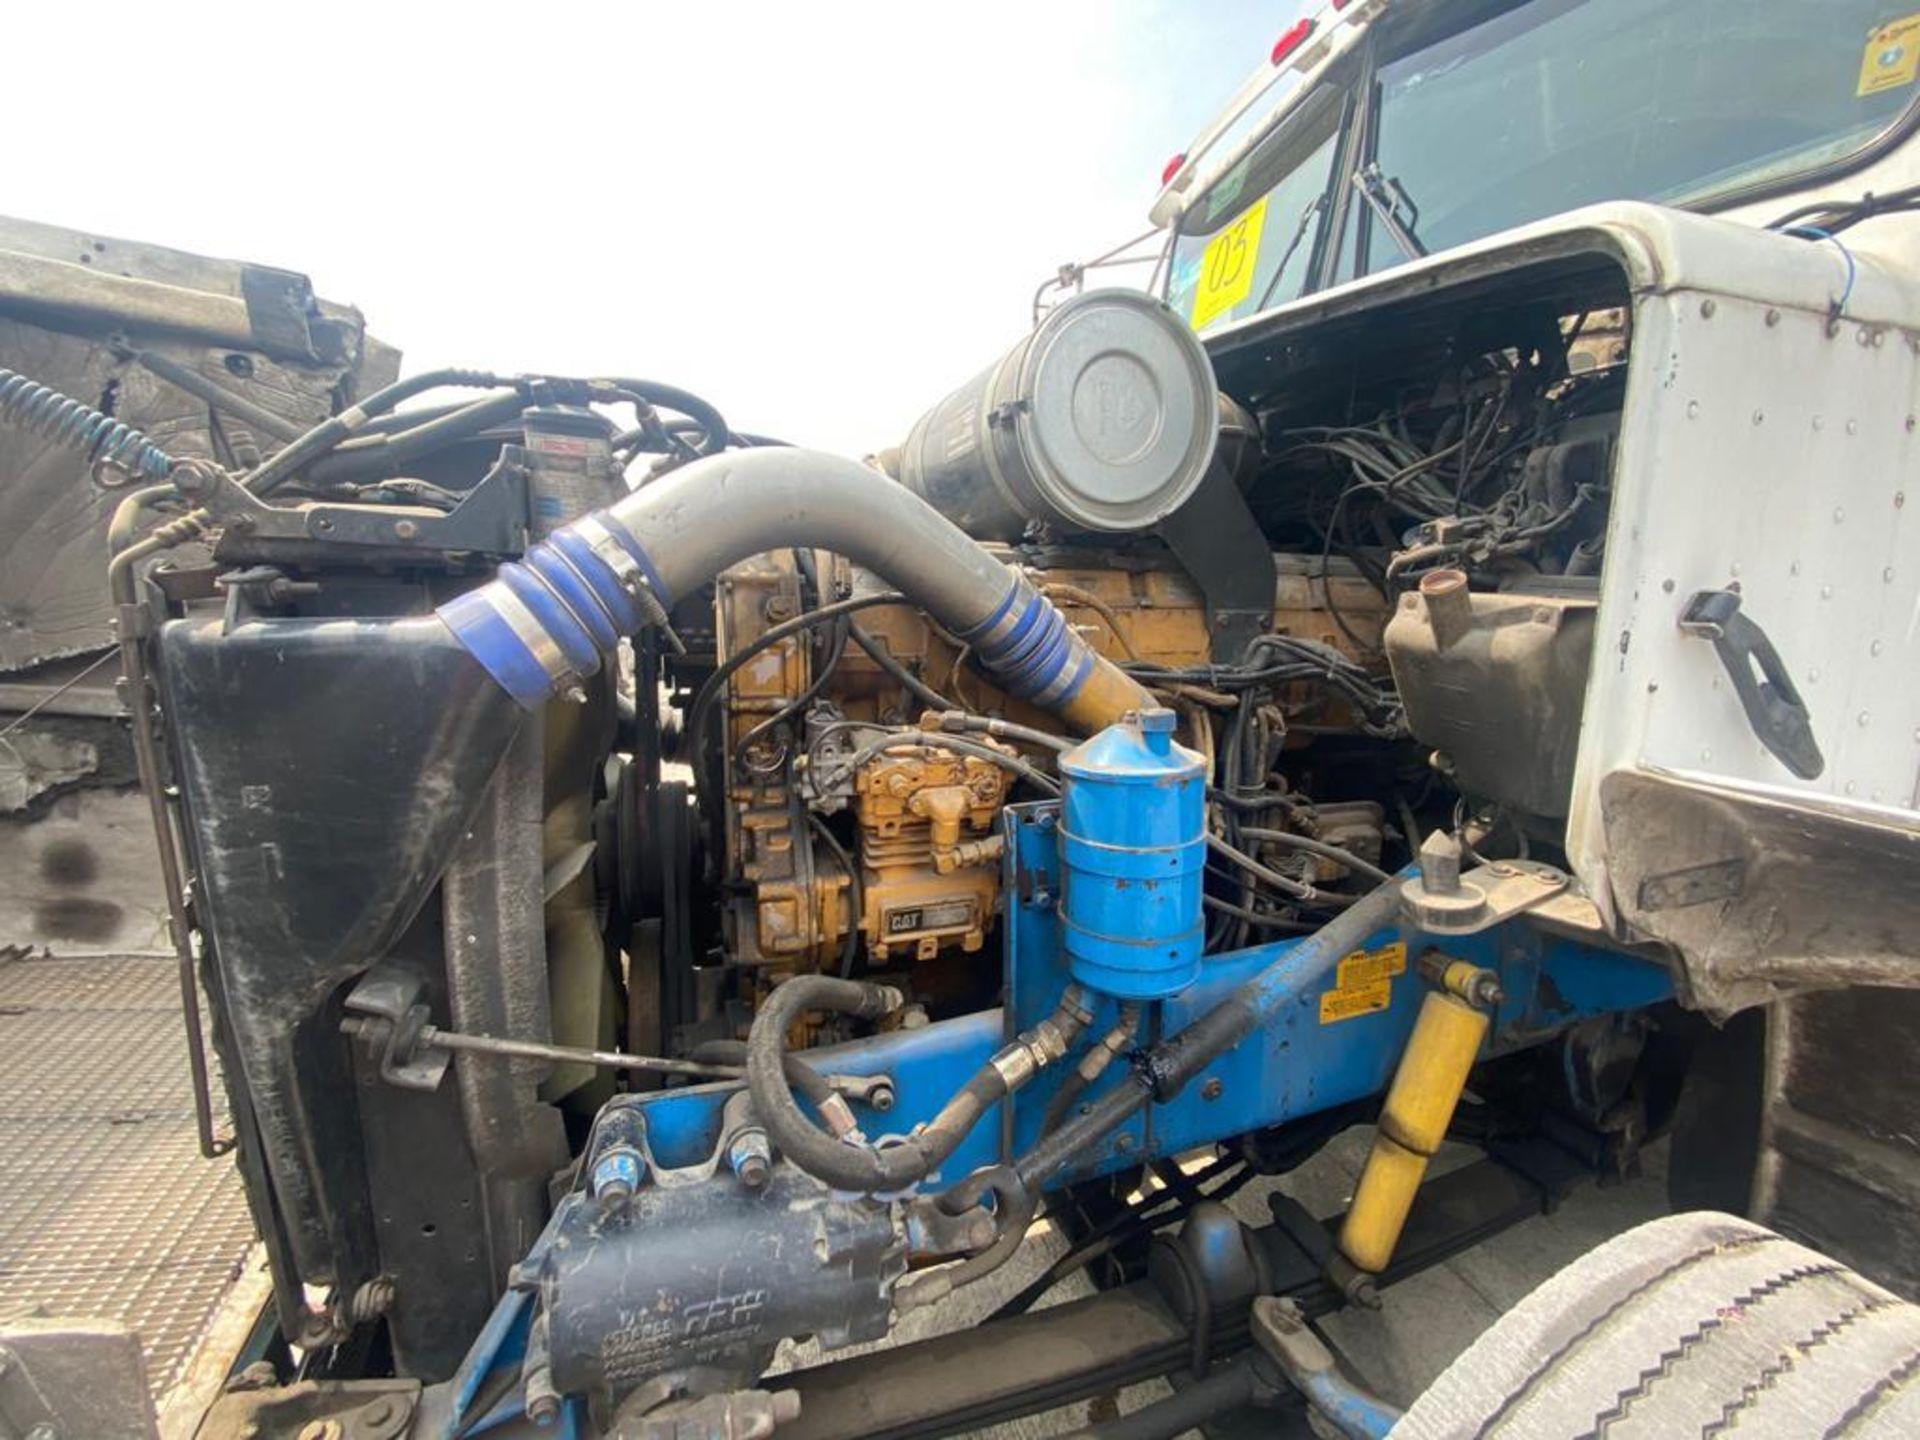 1999 Kenworth Sleeper truck tractor, standard transmission of 18 speeds - Image 51 of 62